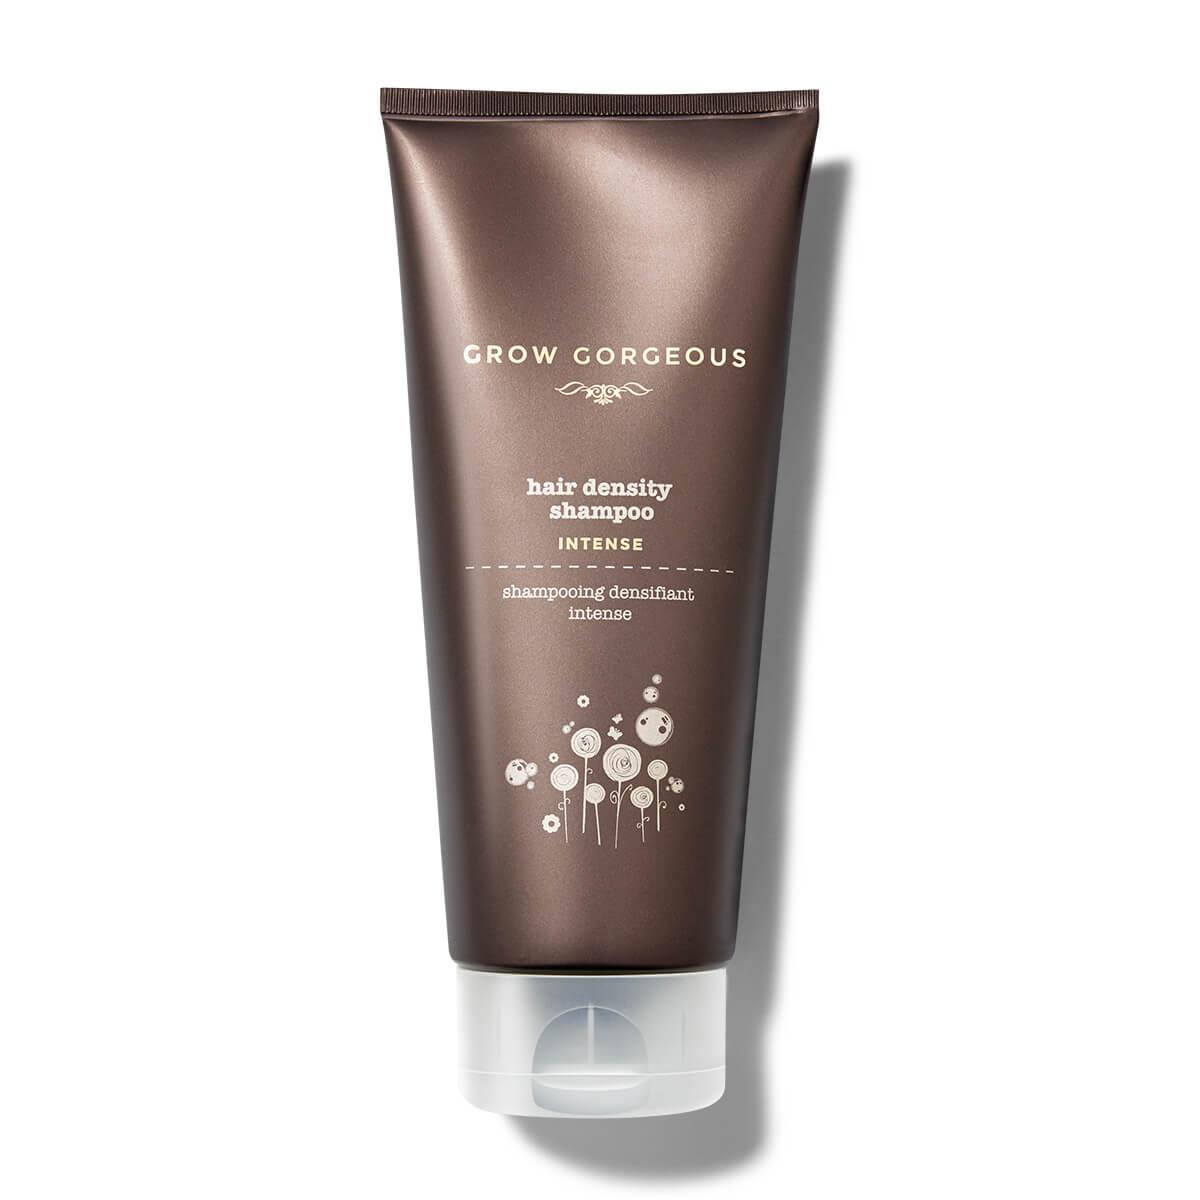 Grow Gorgeous + Hair Density Shampoo Intense